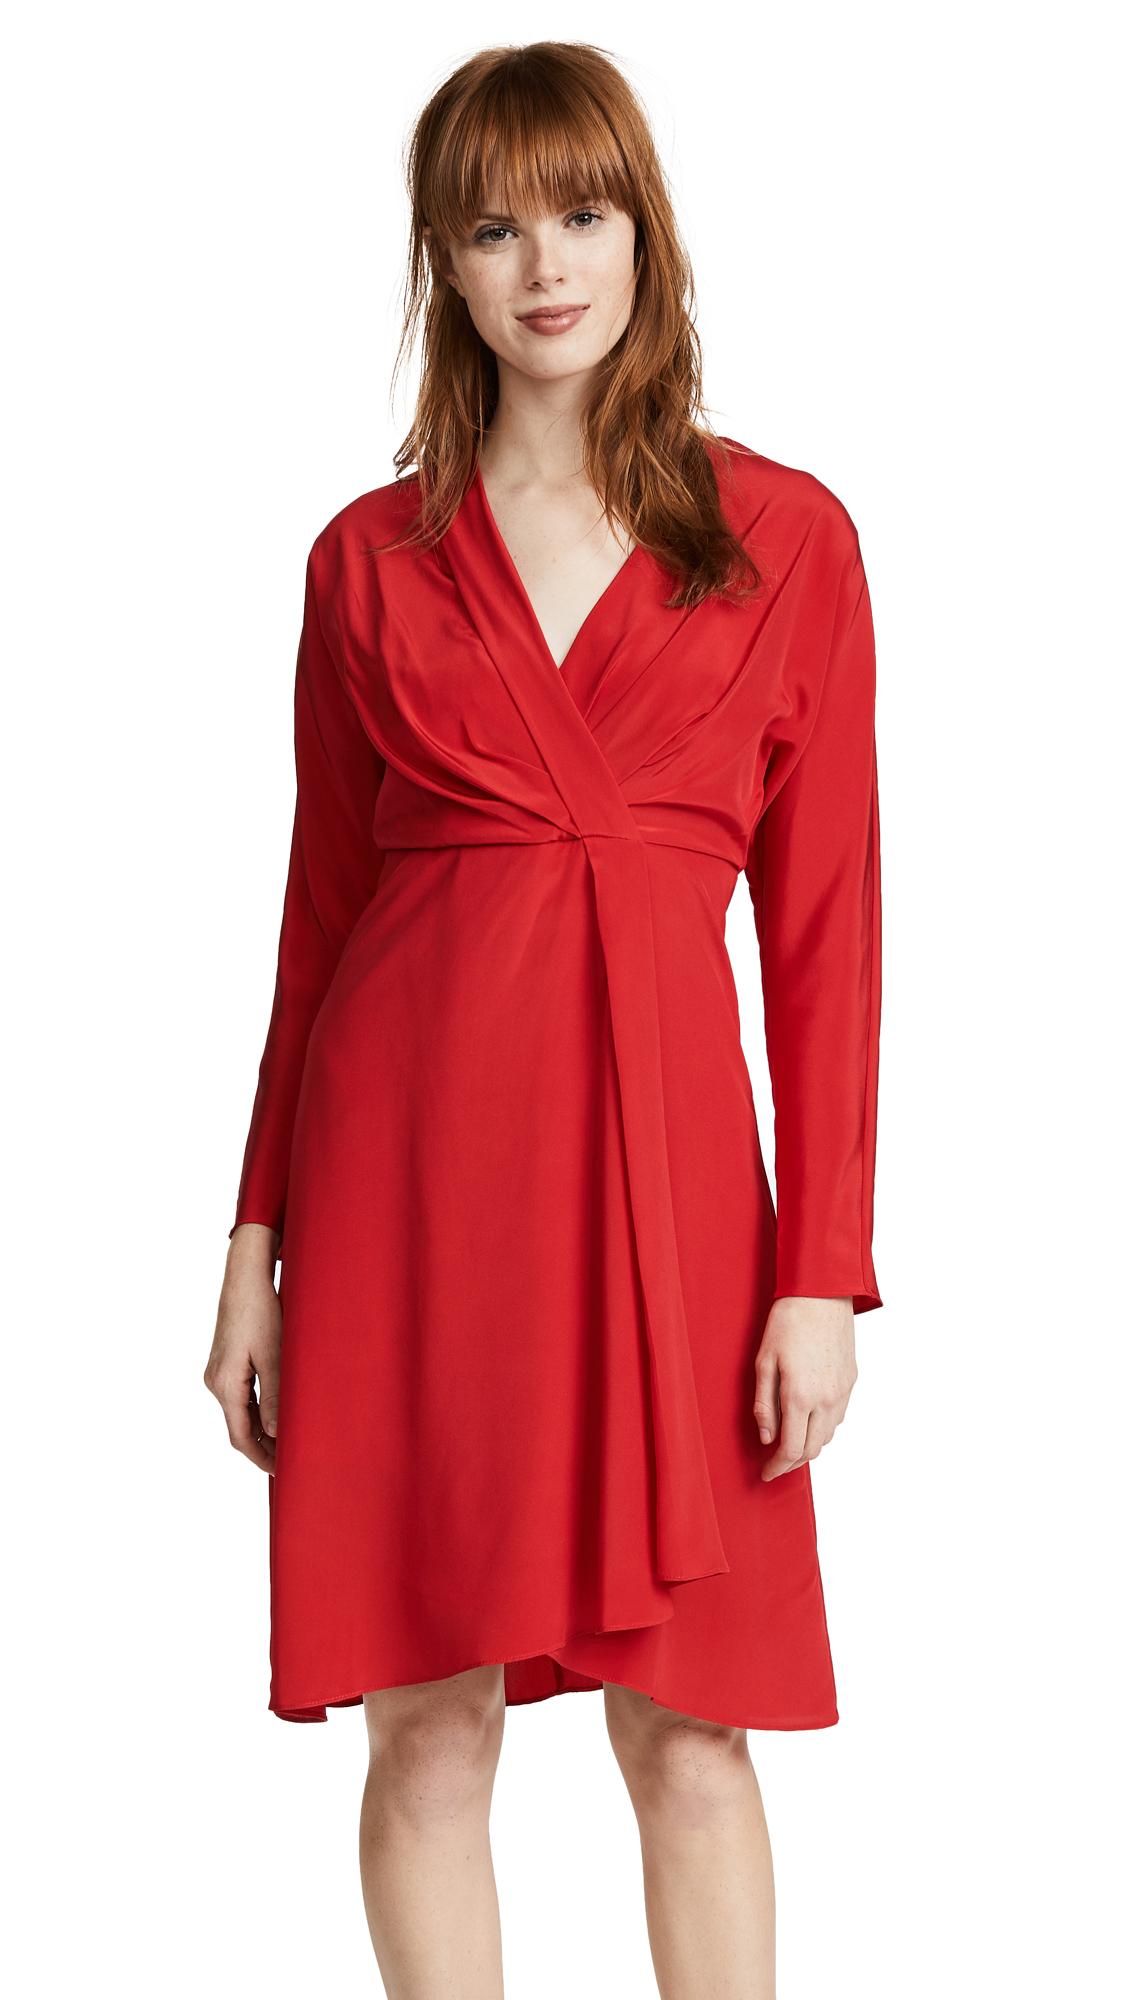 Edition10 V Neck Slim Dress In Pomegranate